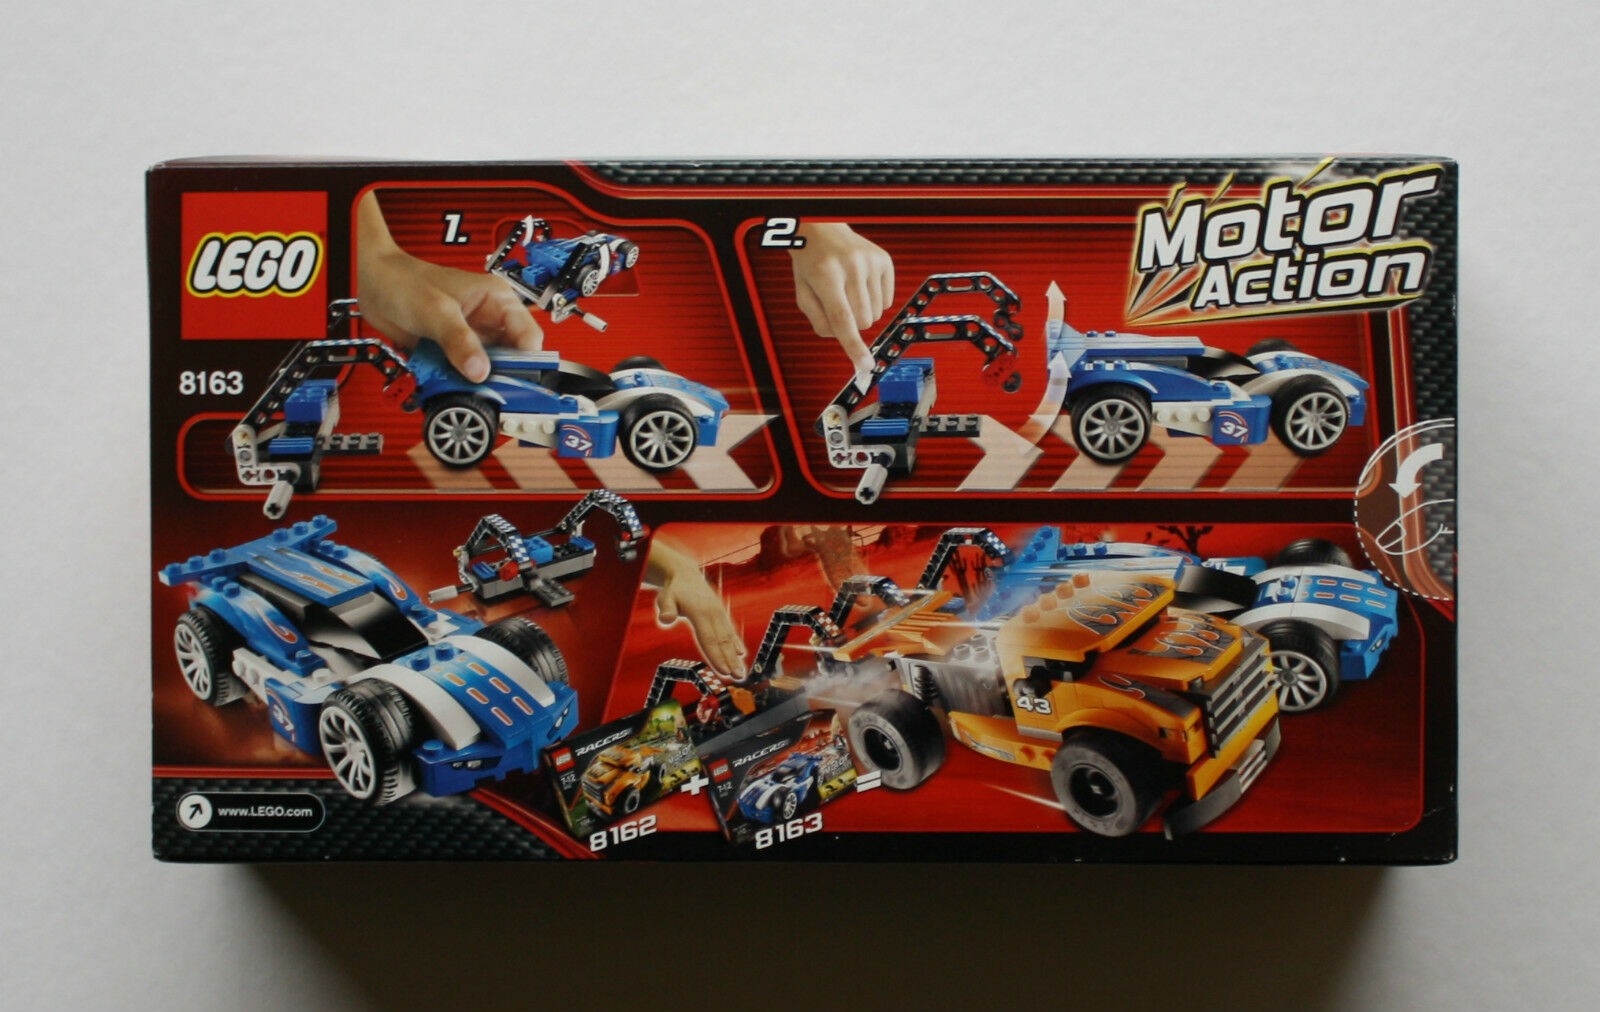 LEGO RACERS blueE SPRINTER MOTOR MOTOR MOTOR ACTION 8163 BRAND NEW SEALED IN BOX SET RETIRED 86400c